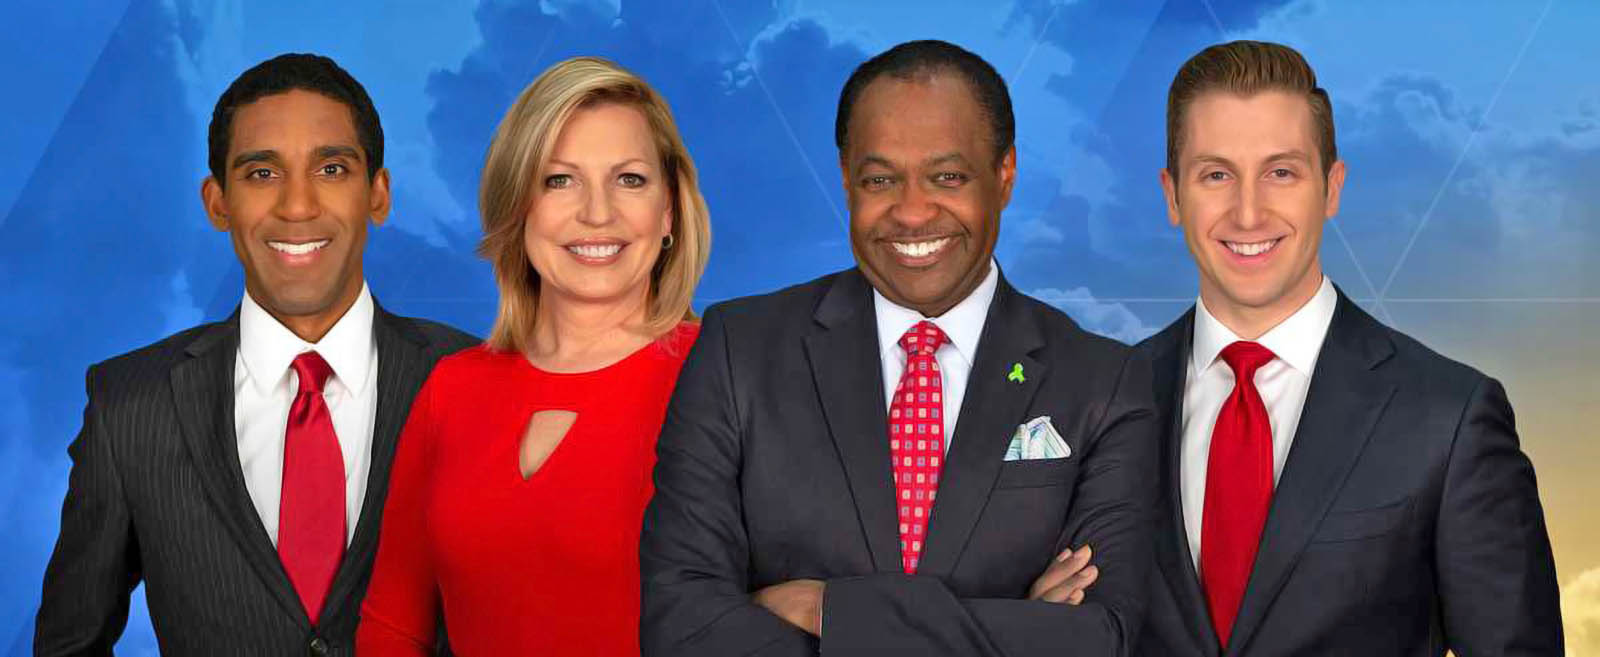 KMBC 9 News Live Weather Team at KMBC 9 News